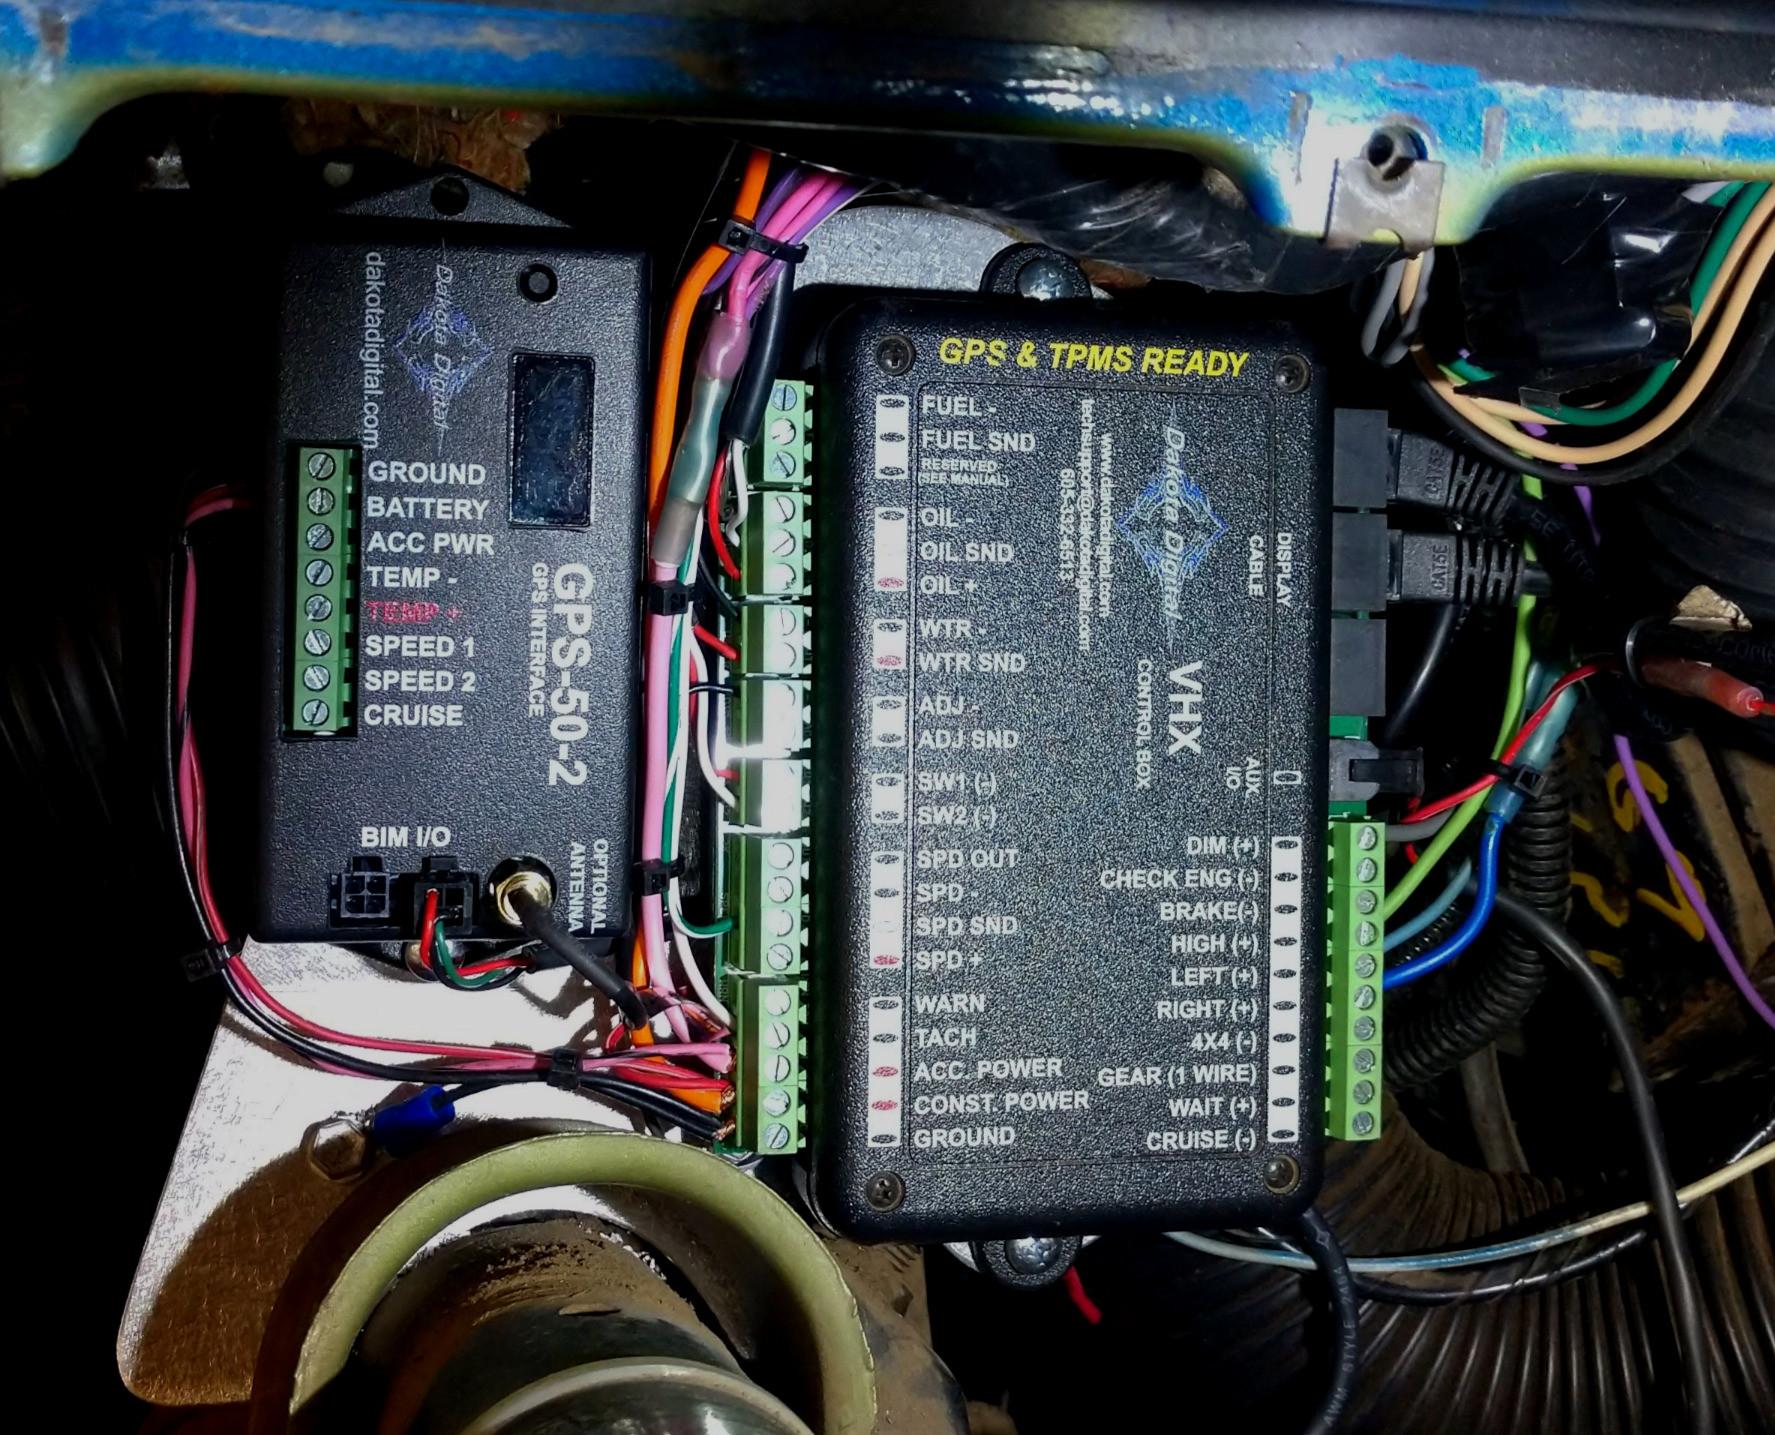 Chassis Wiring/LSx Wiring